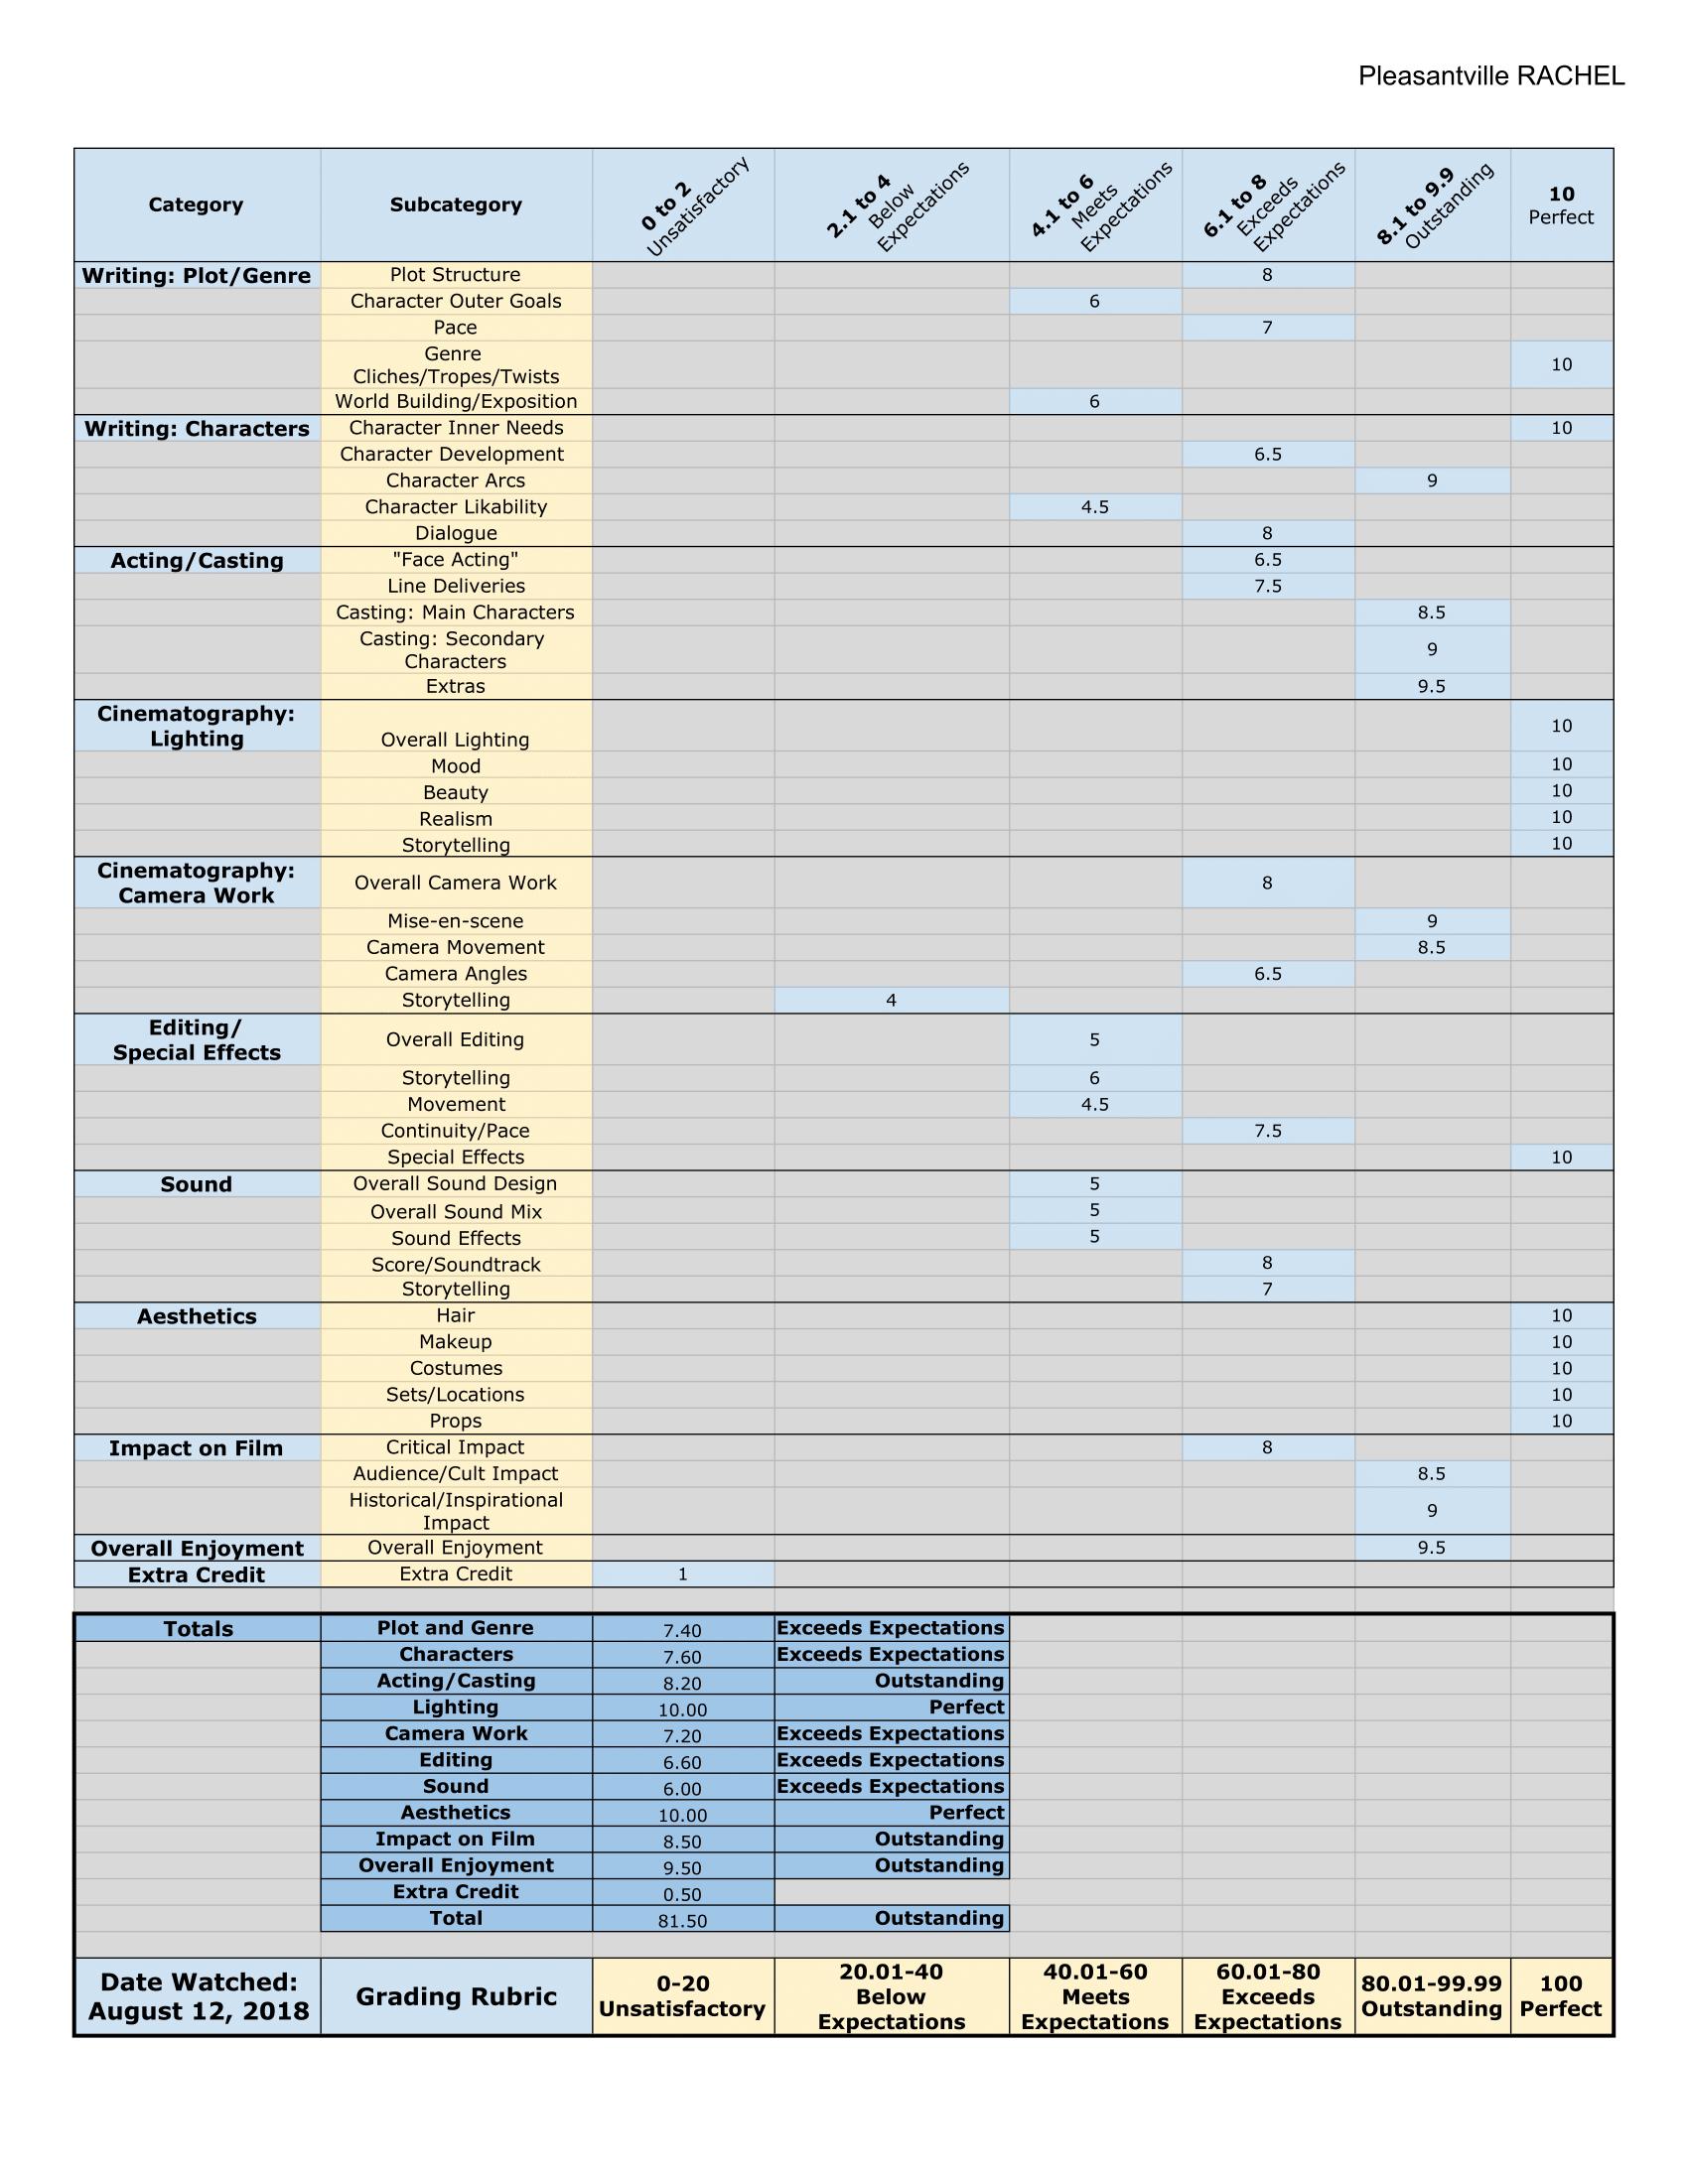 The Grid 2018 - Pleasantville RACHEL-1.png